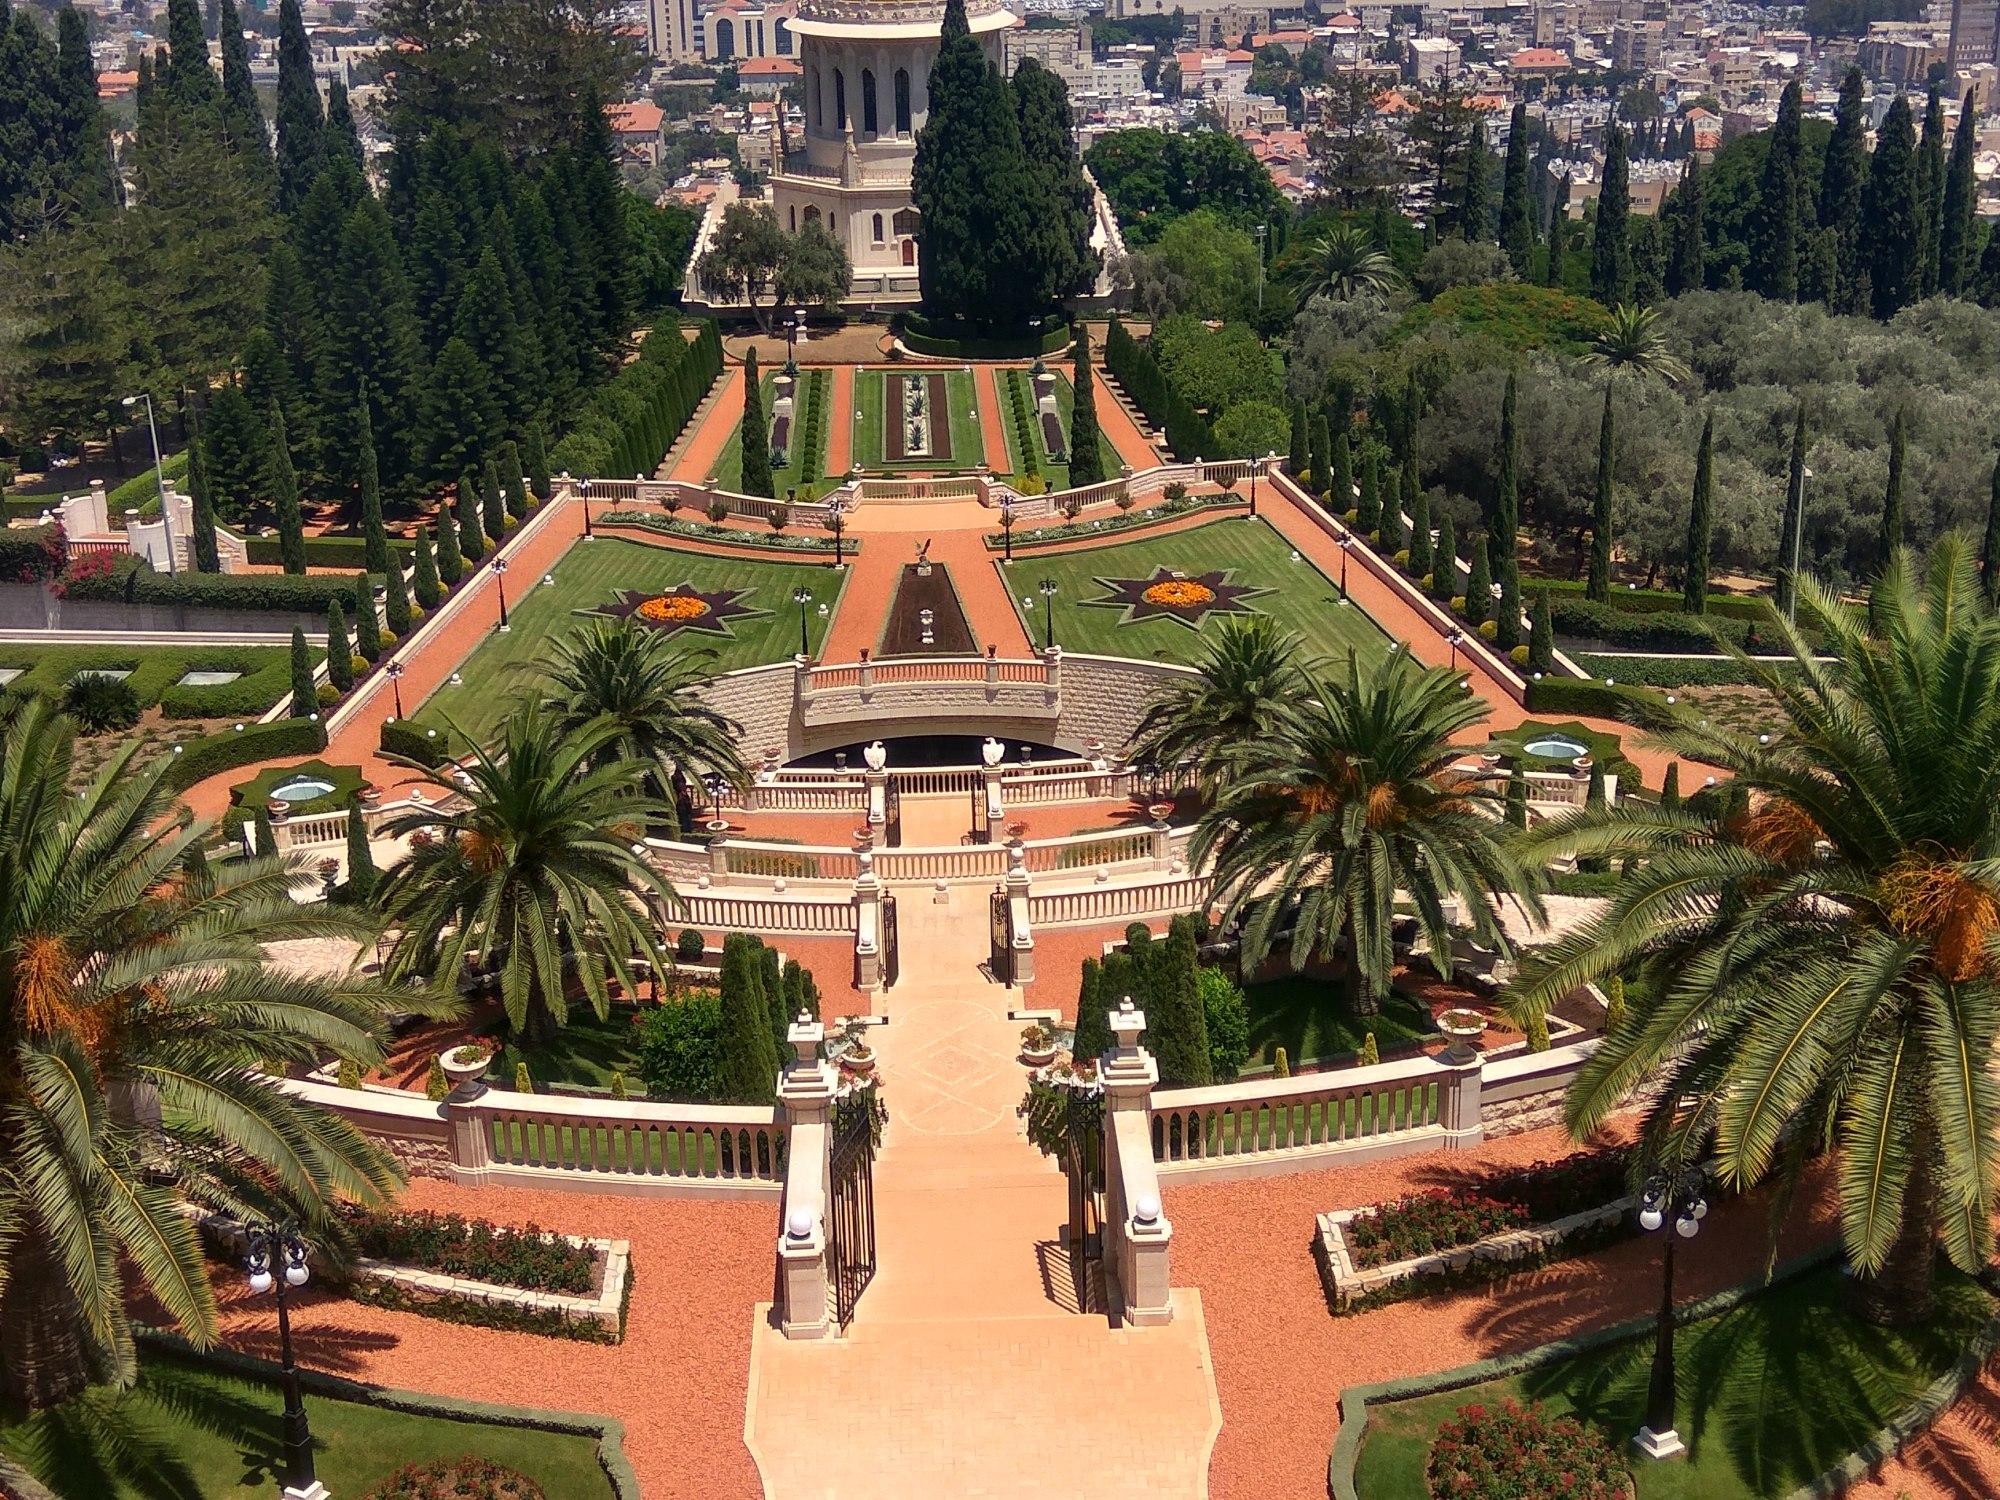 Israel – Haifa, Tel Aviv & Acre – Owen Travels